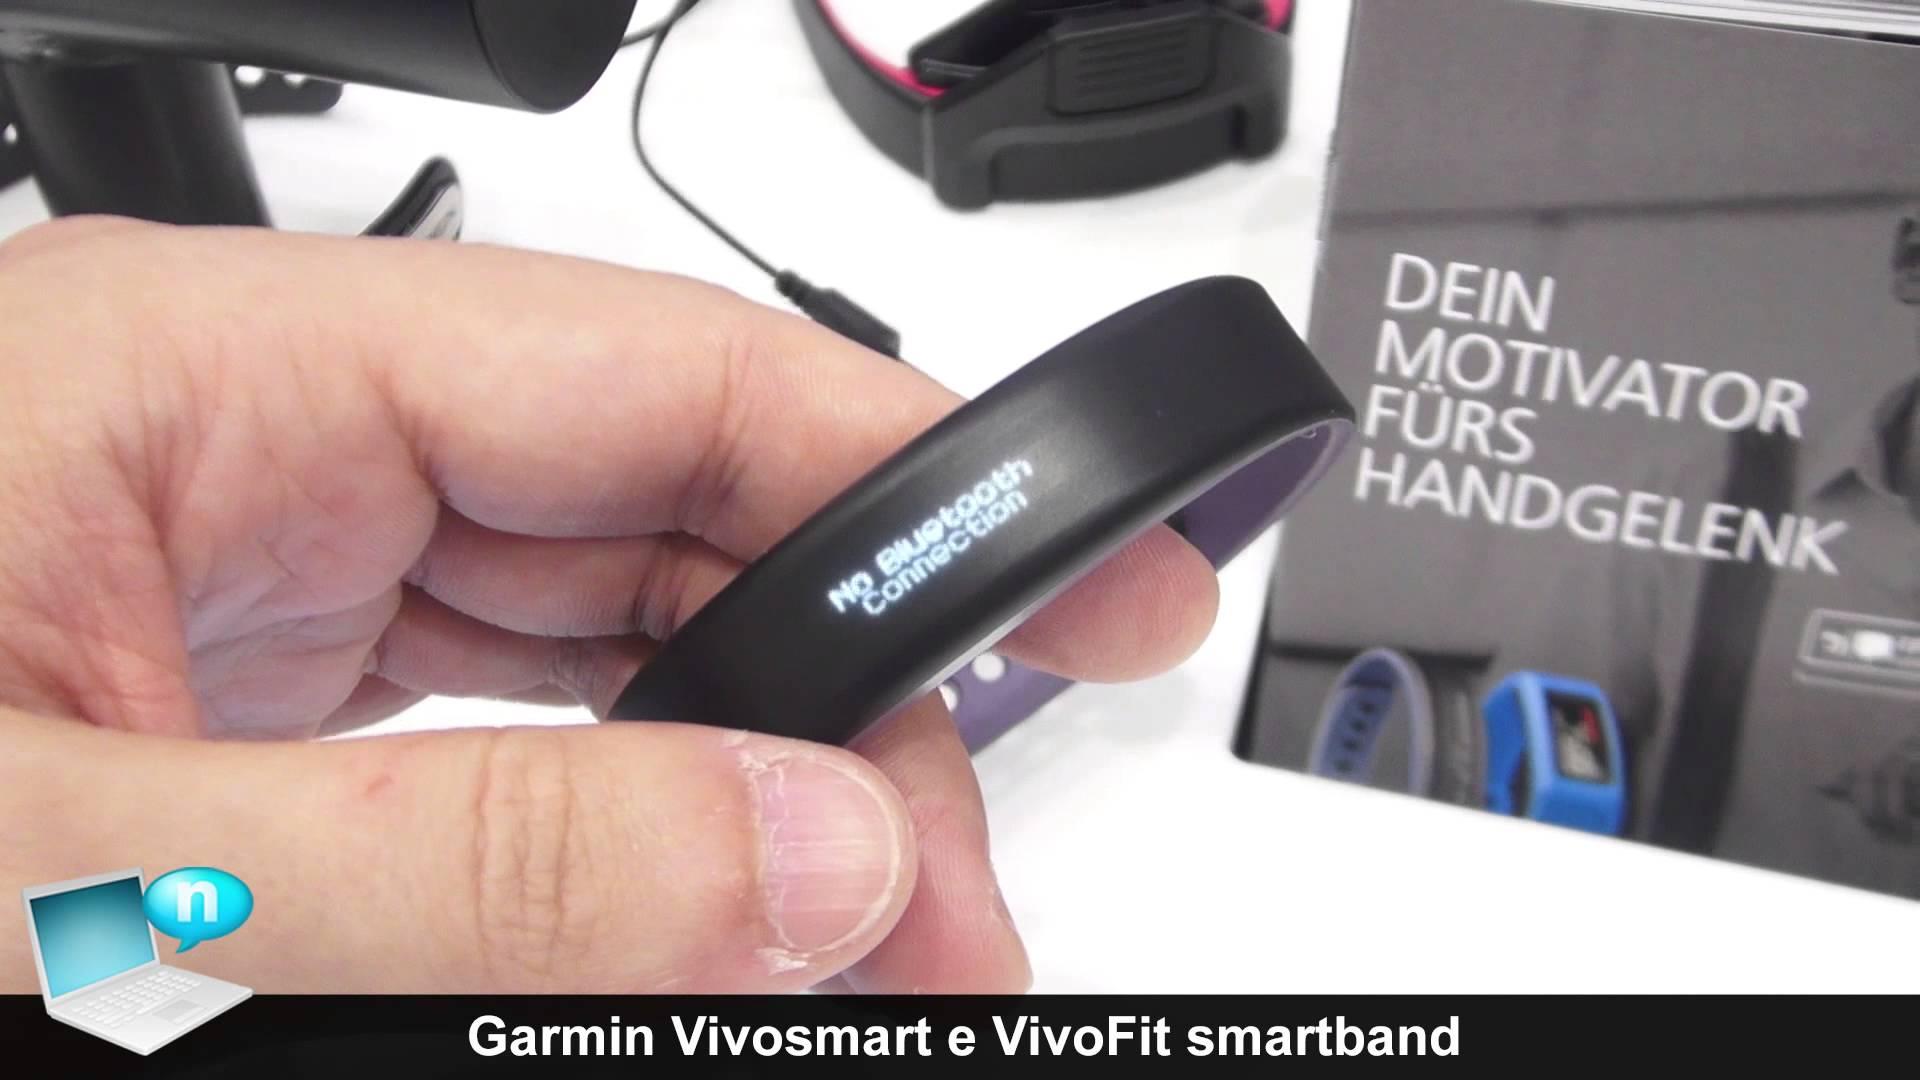 Garmin Vivosmart Vs Vivofit - Which is better?